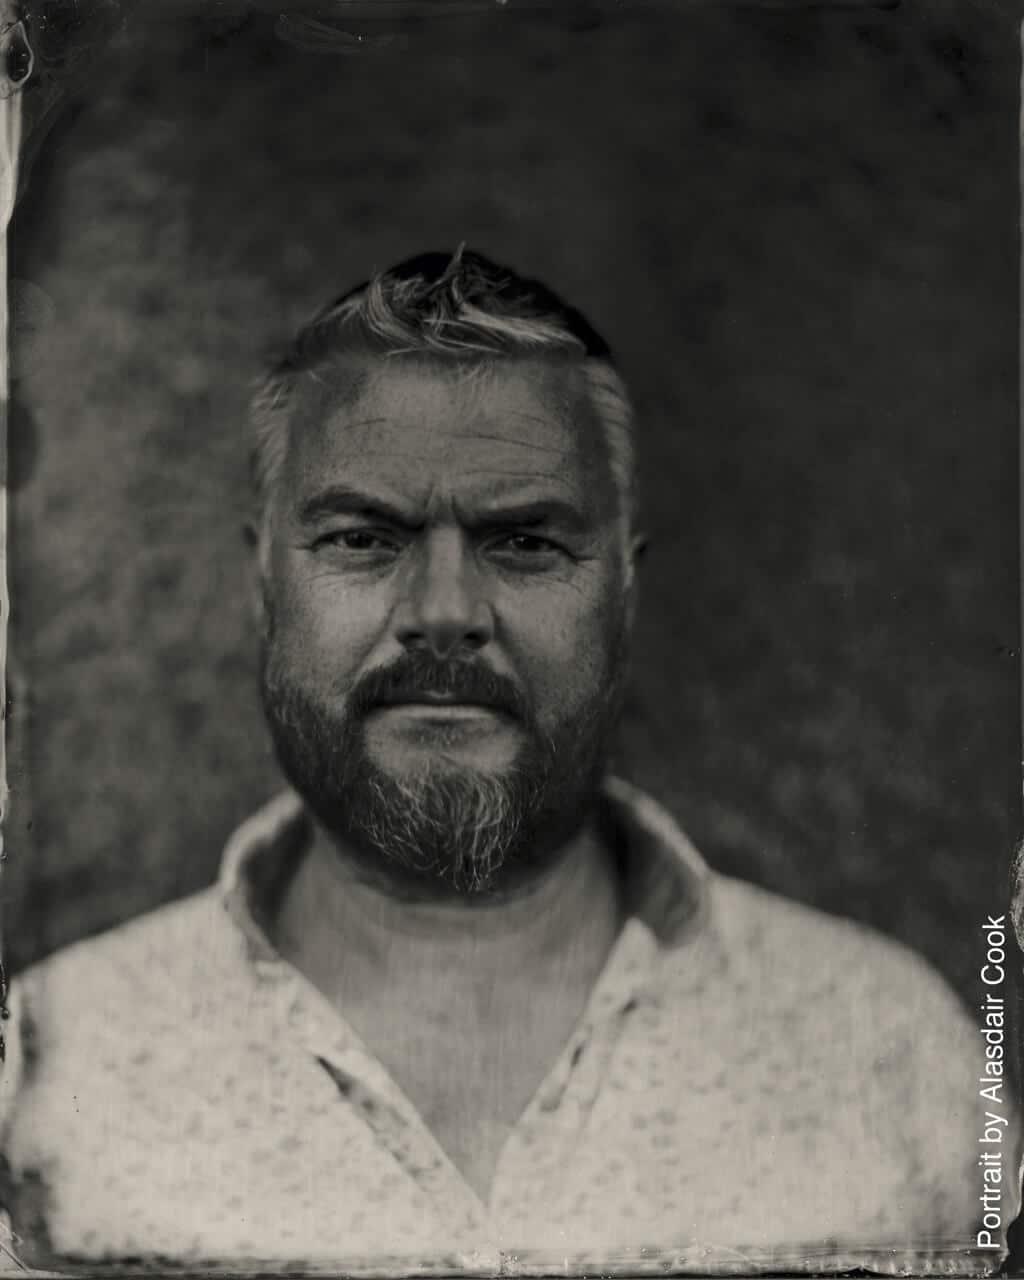 Profile image of Rob McDougall Professional Photographer and Film Maker Edinburgh